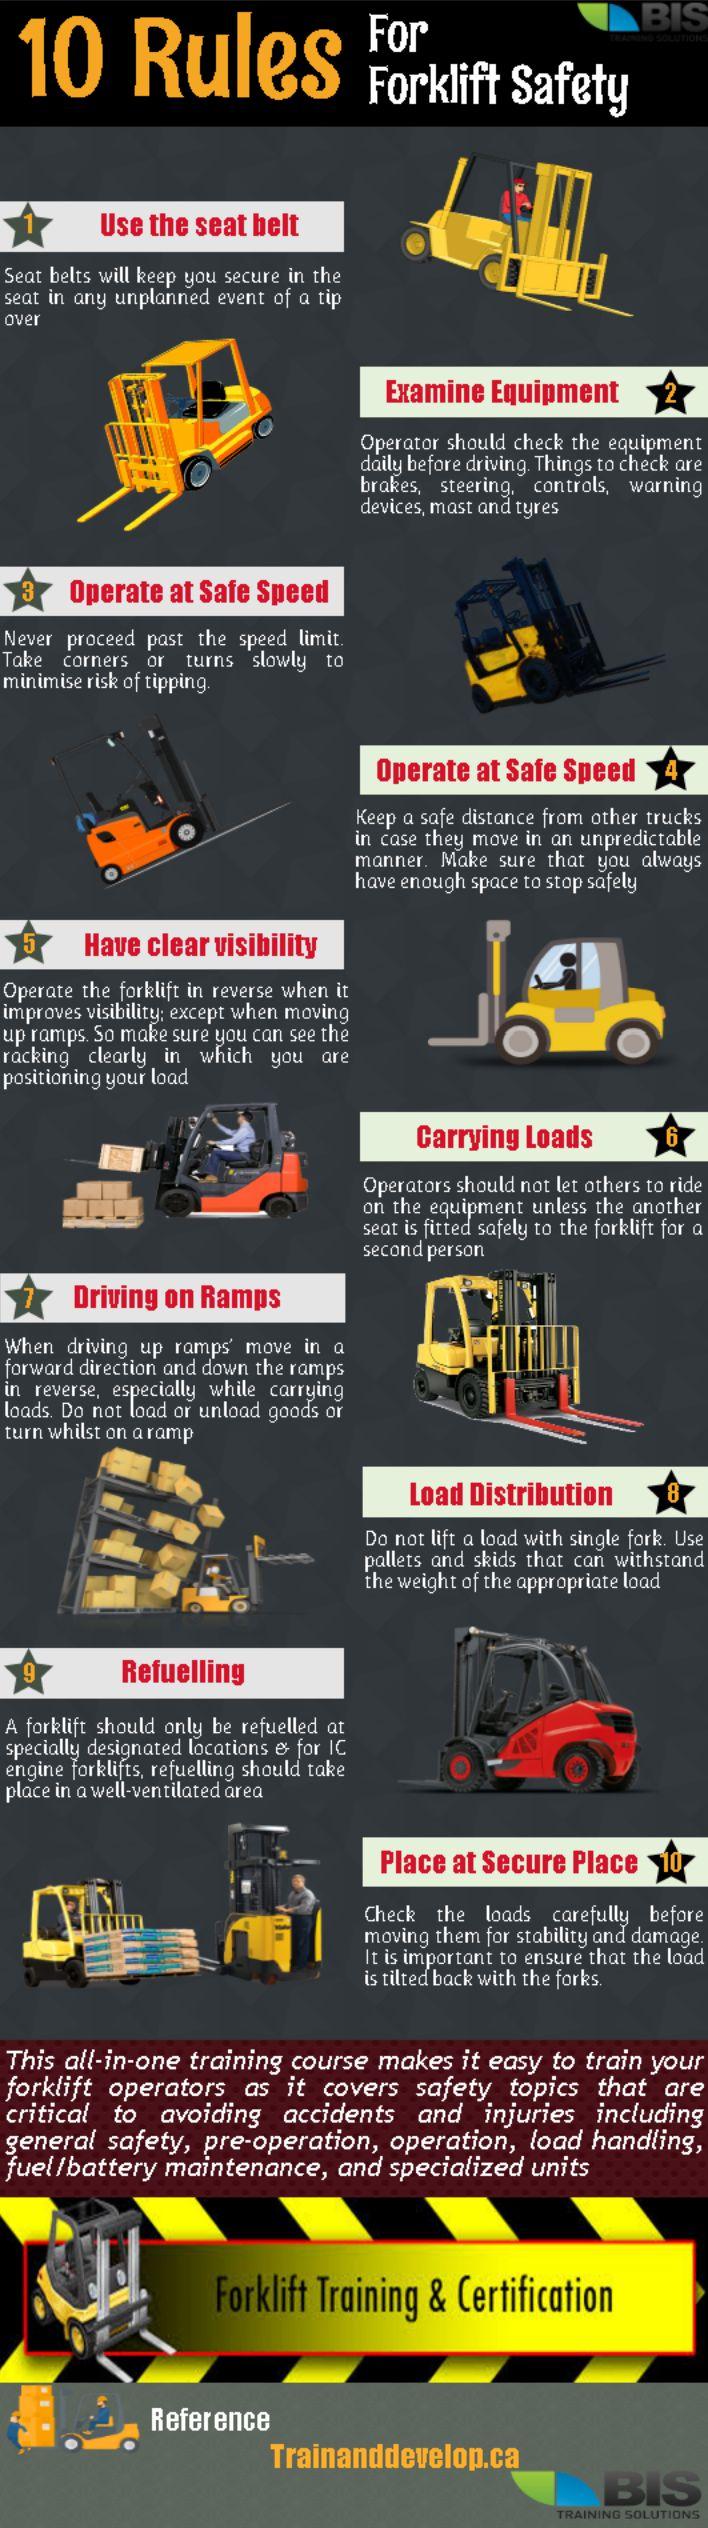 Forklift Safety Training #workplace #workatheight #safetytraining